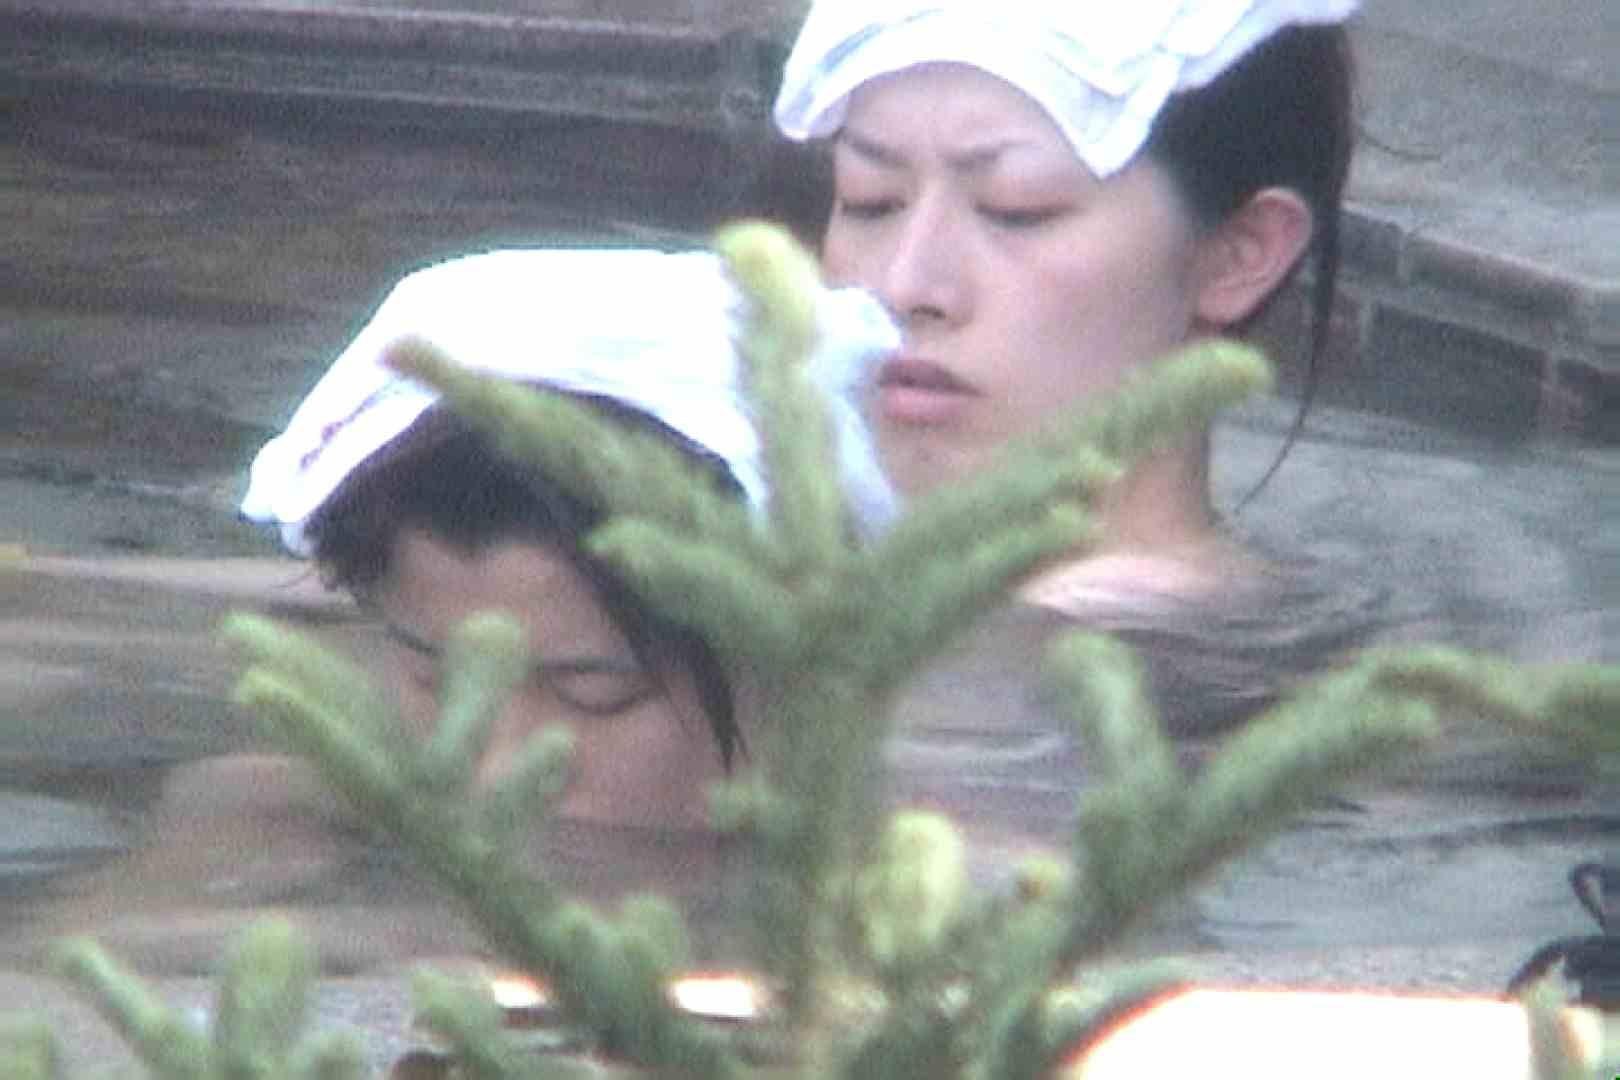 Aquaな露天風呂Vol.80【VIP限定】 盗撮 | HなOL  66pic 52